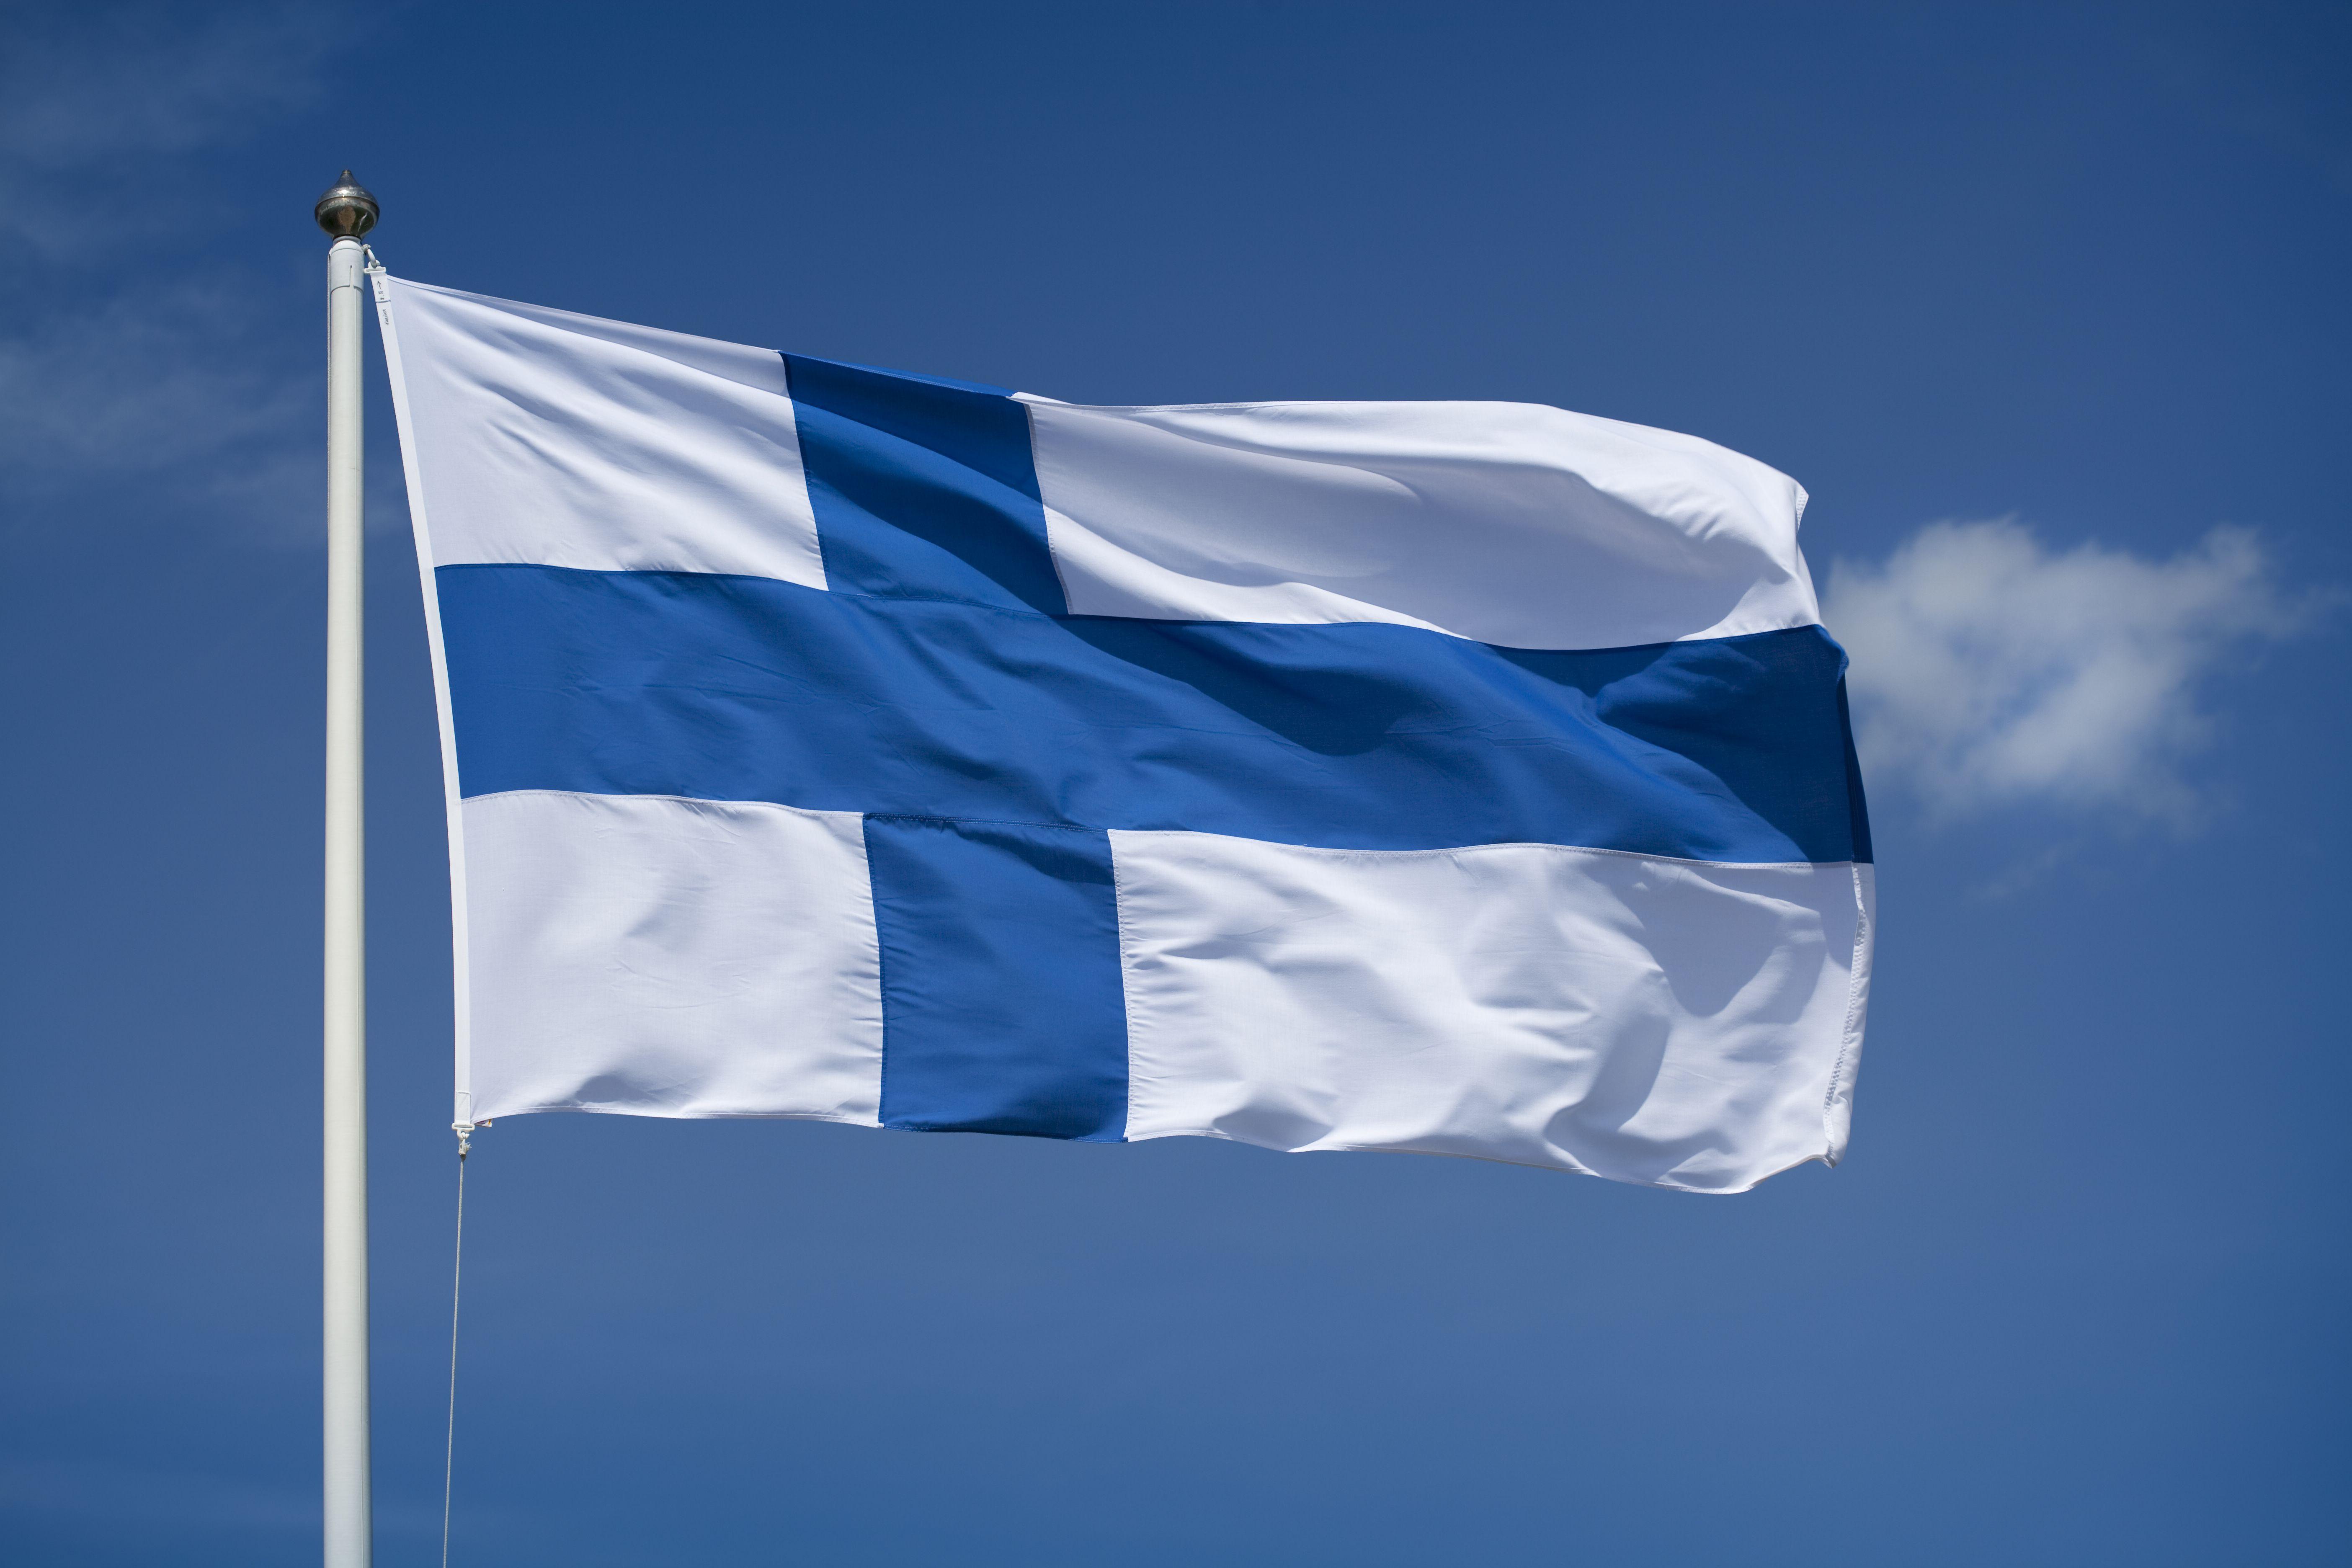 Hoisted Finnish flag with a blue sky background